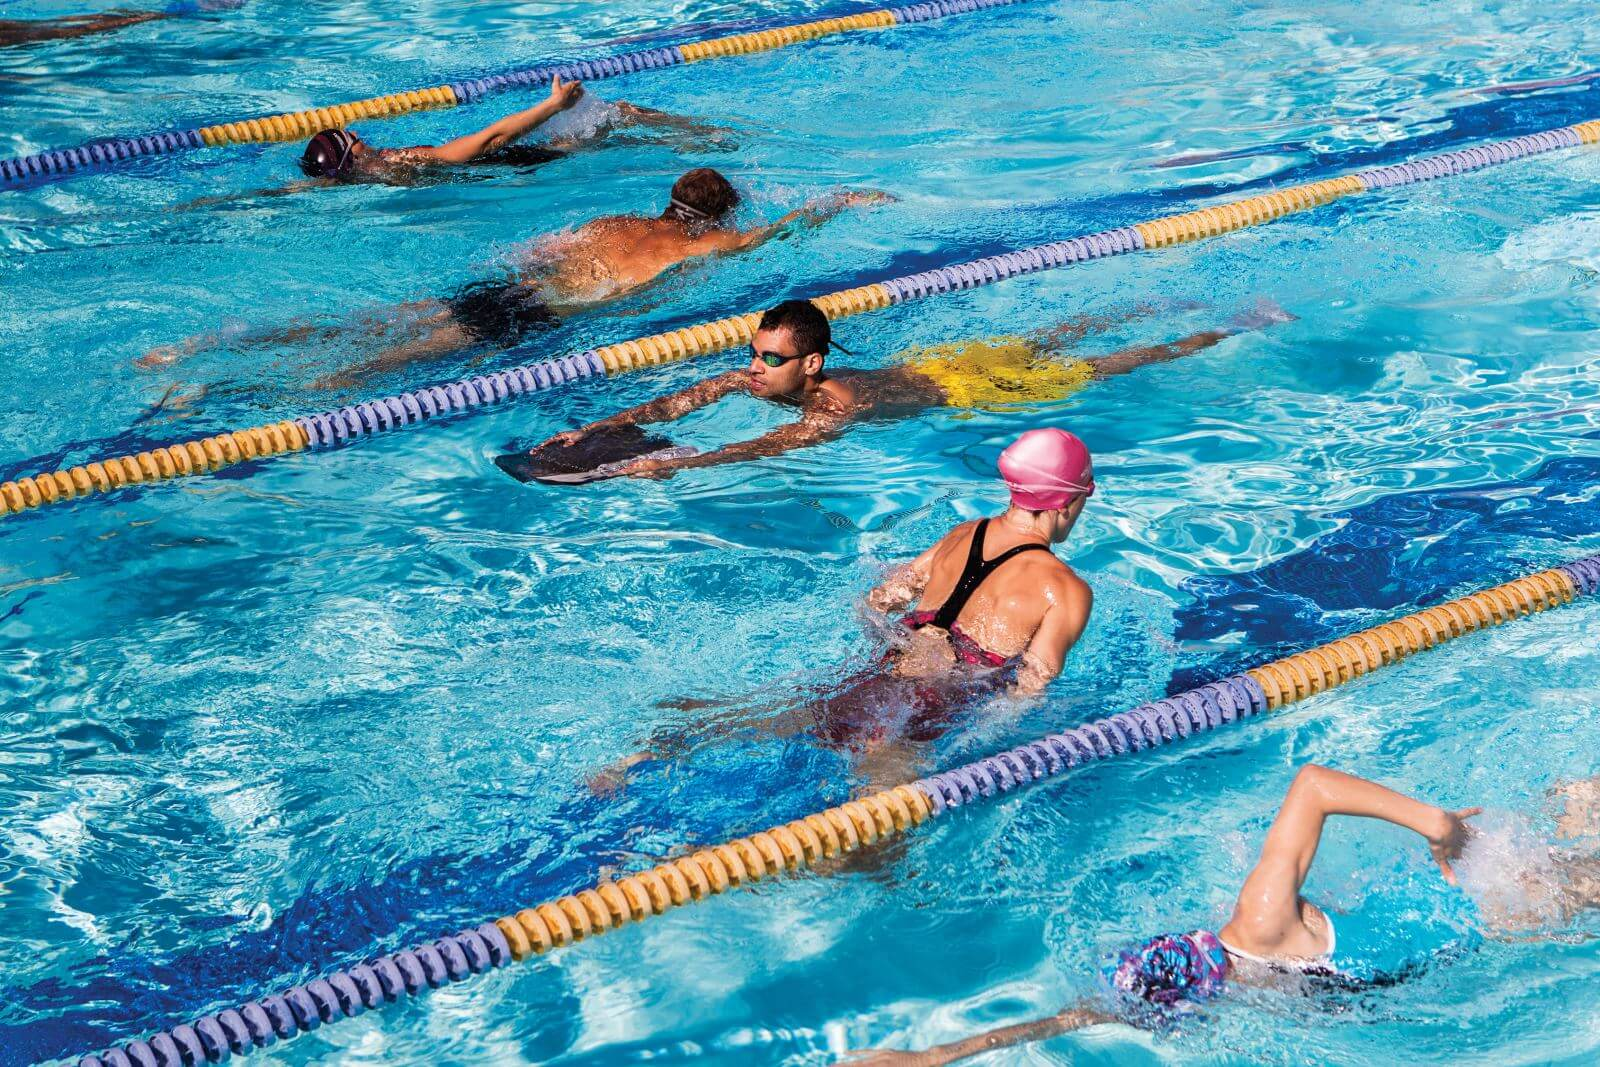 Maximize pool time